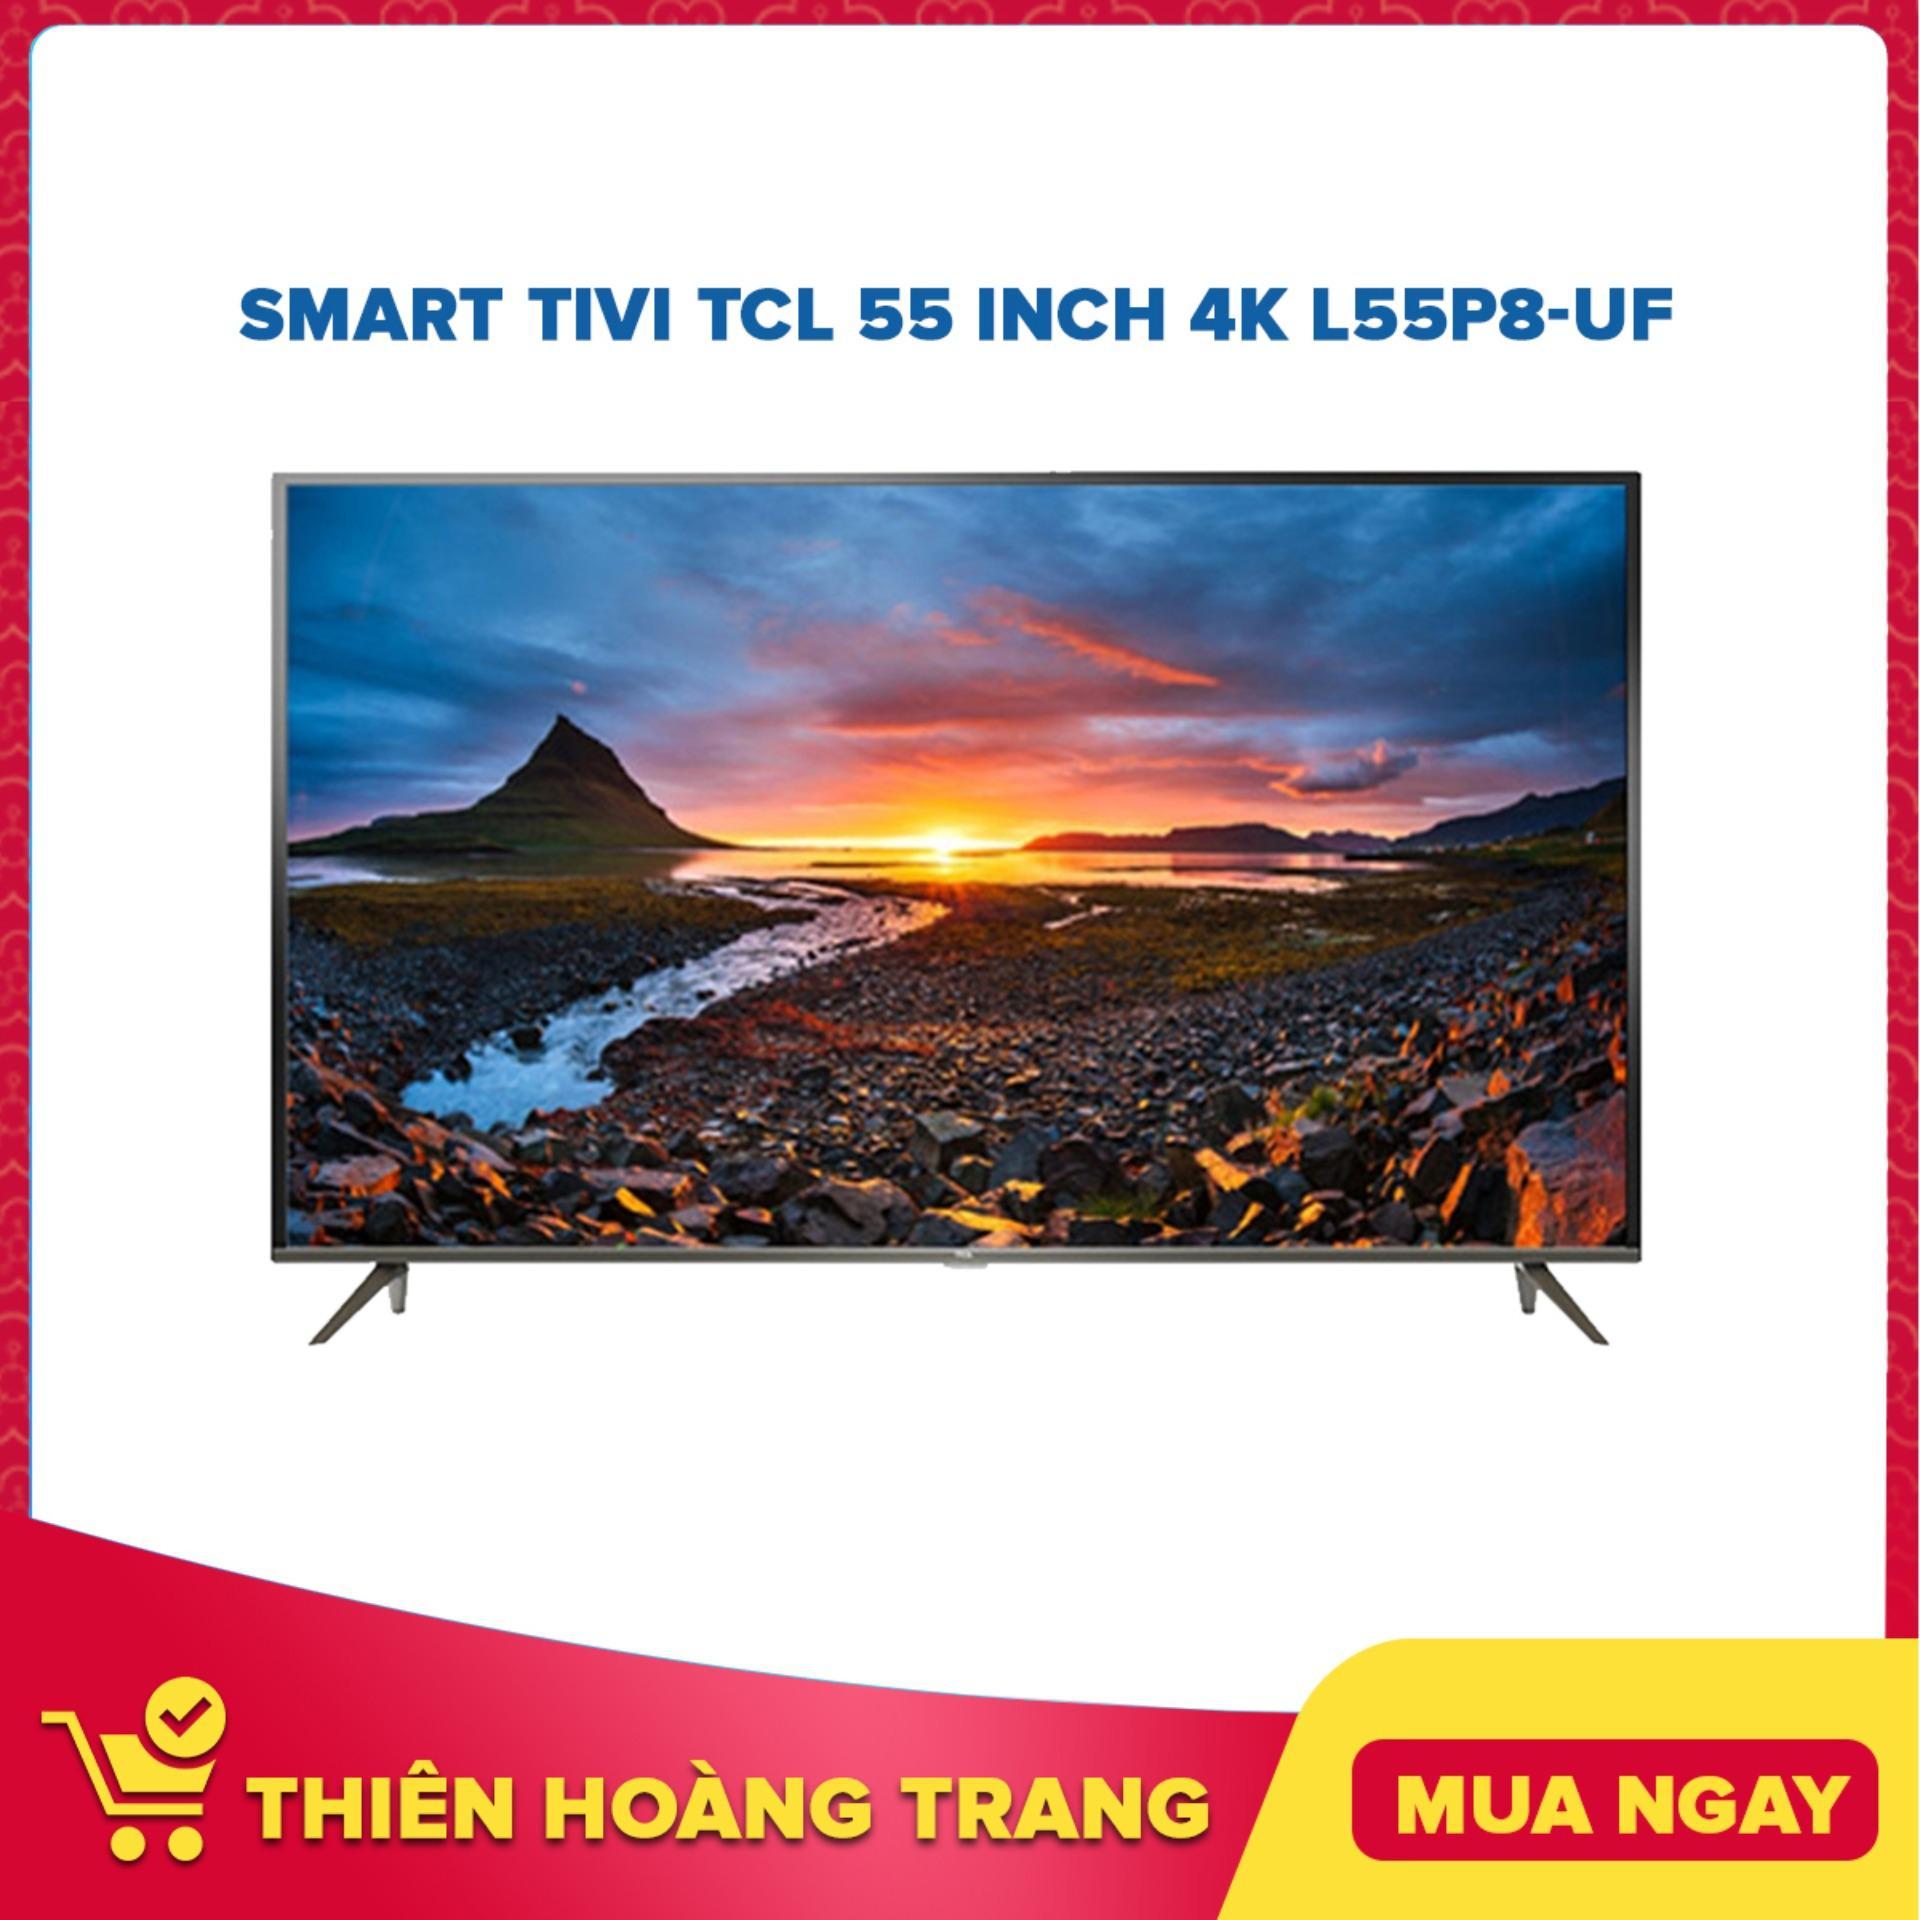 Bảng giá Smart Tivi TCL 55 inch 4K L55P8-UF